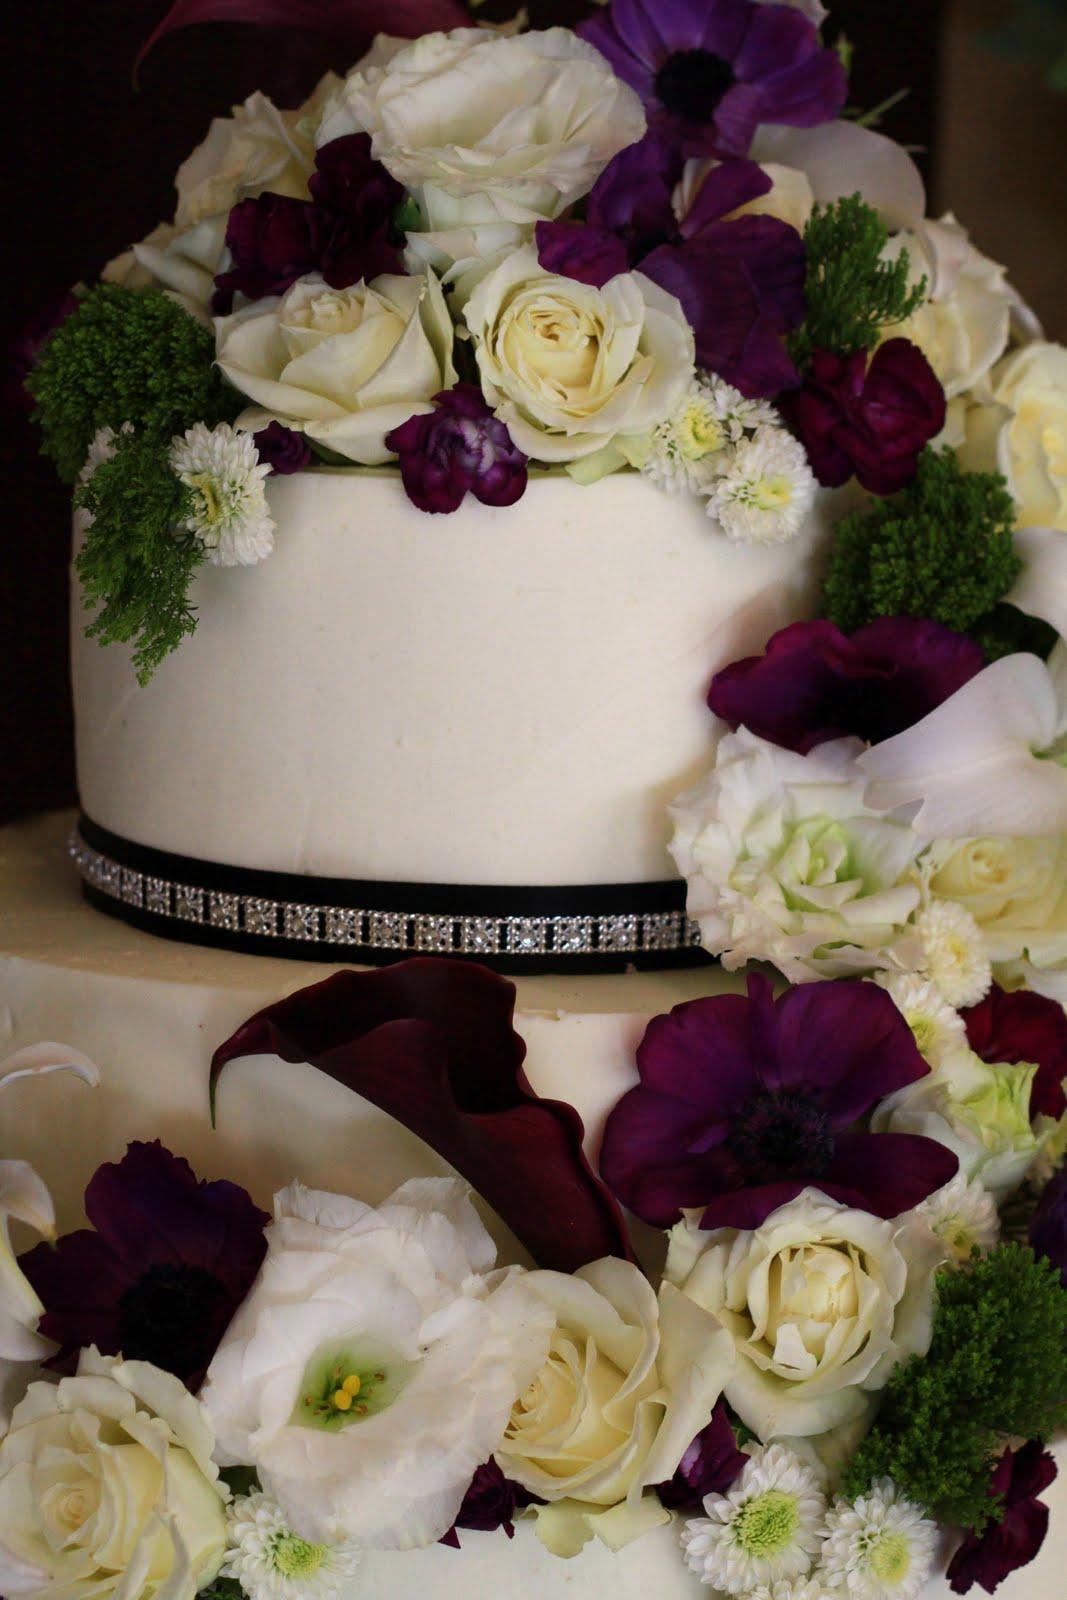 Exquisite Cookies: 3 Tier wedding cake with fresh flowers